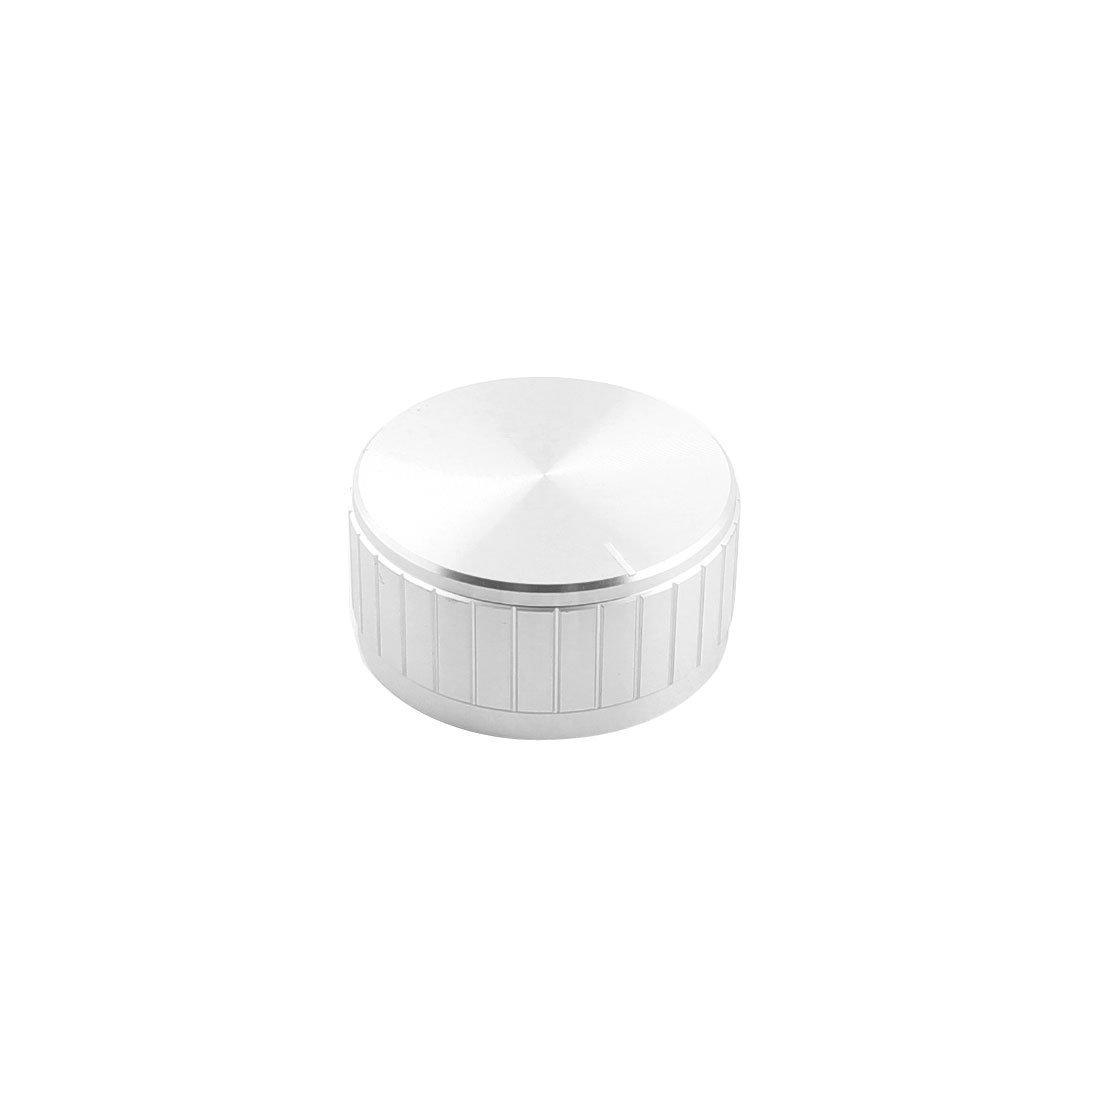 Uxcell Aluminum Potentiometer Volume Knob 40 mm x 20 mm for 6 mm Diameter Knurled Shaft